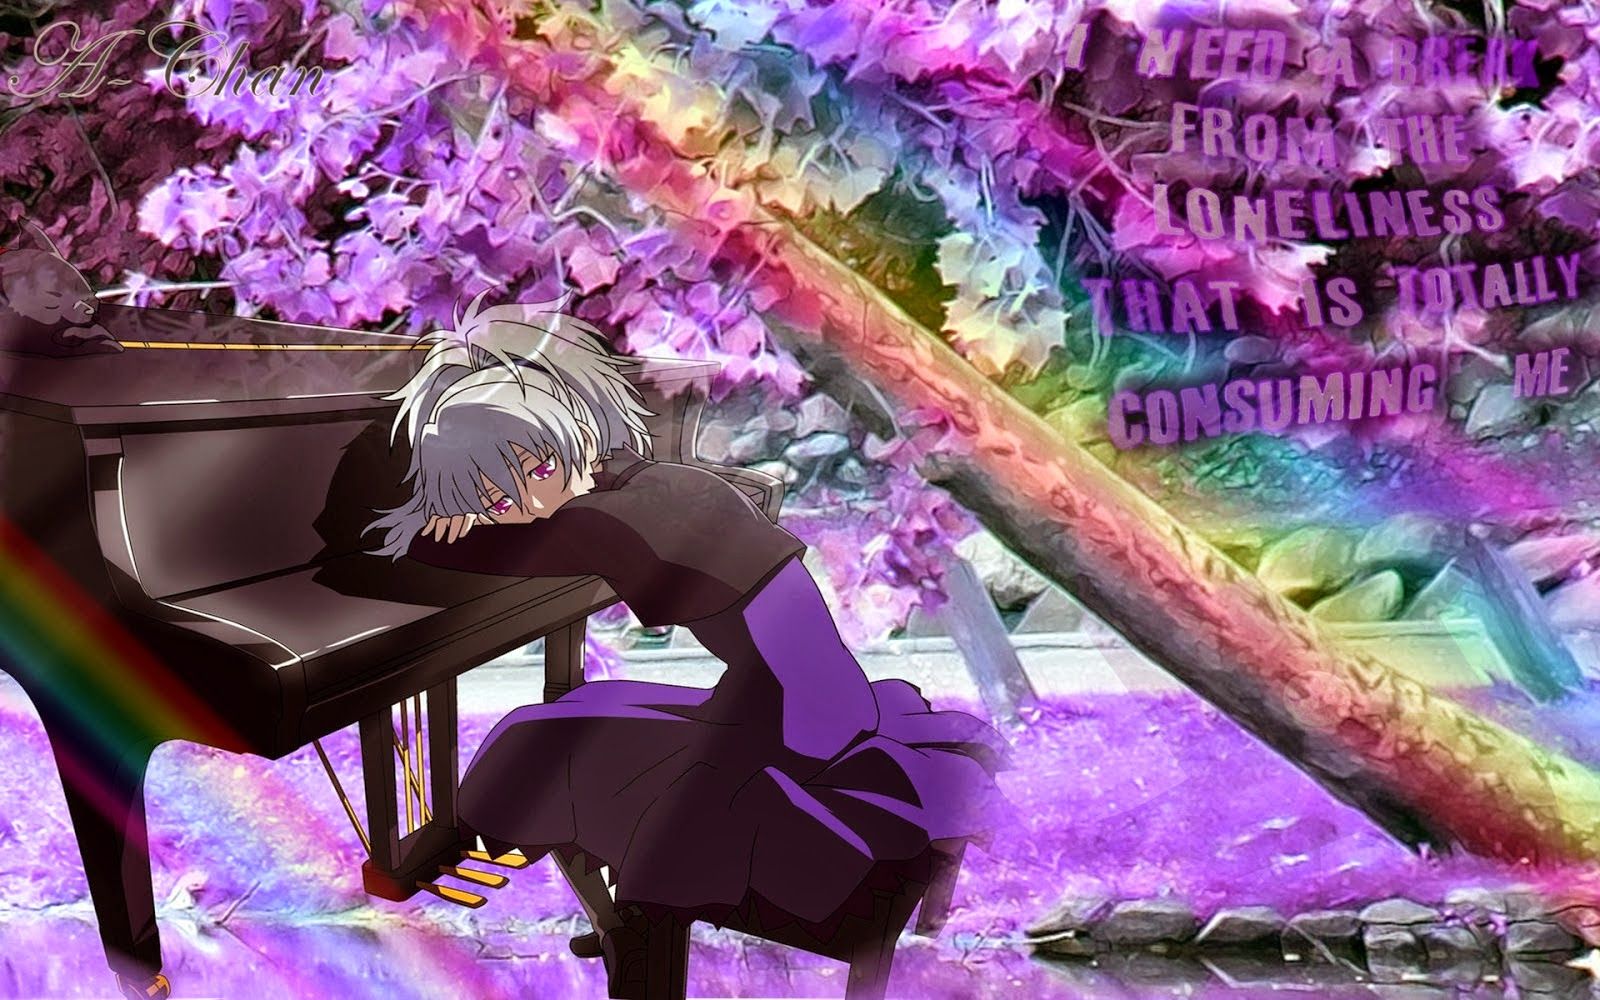 Rain Boy And Girl Wallpaper Sad Anime Girl Facebook Cover I M So Lonely